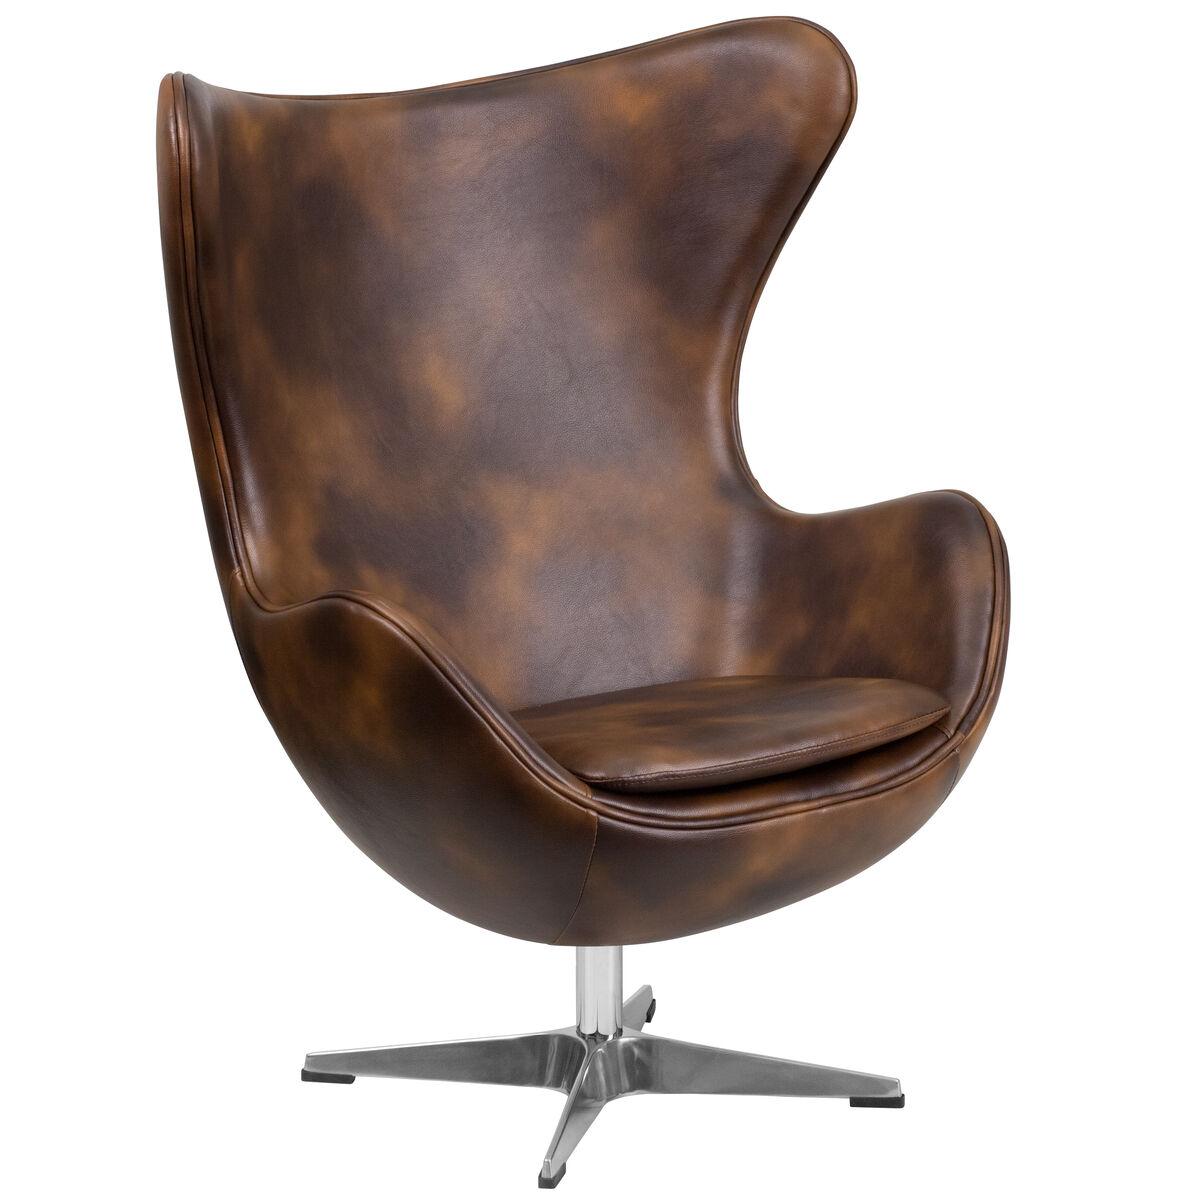 Cool Bomber Jacket Leather Egg Chair With Tilt Lock Mechanism Ibusinesslaw Wood Chair Design Ideas Ibusinesslaworg